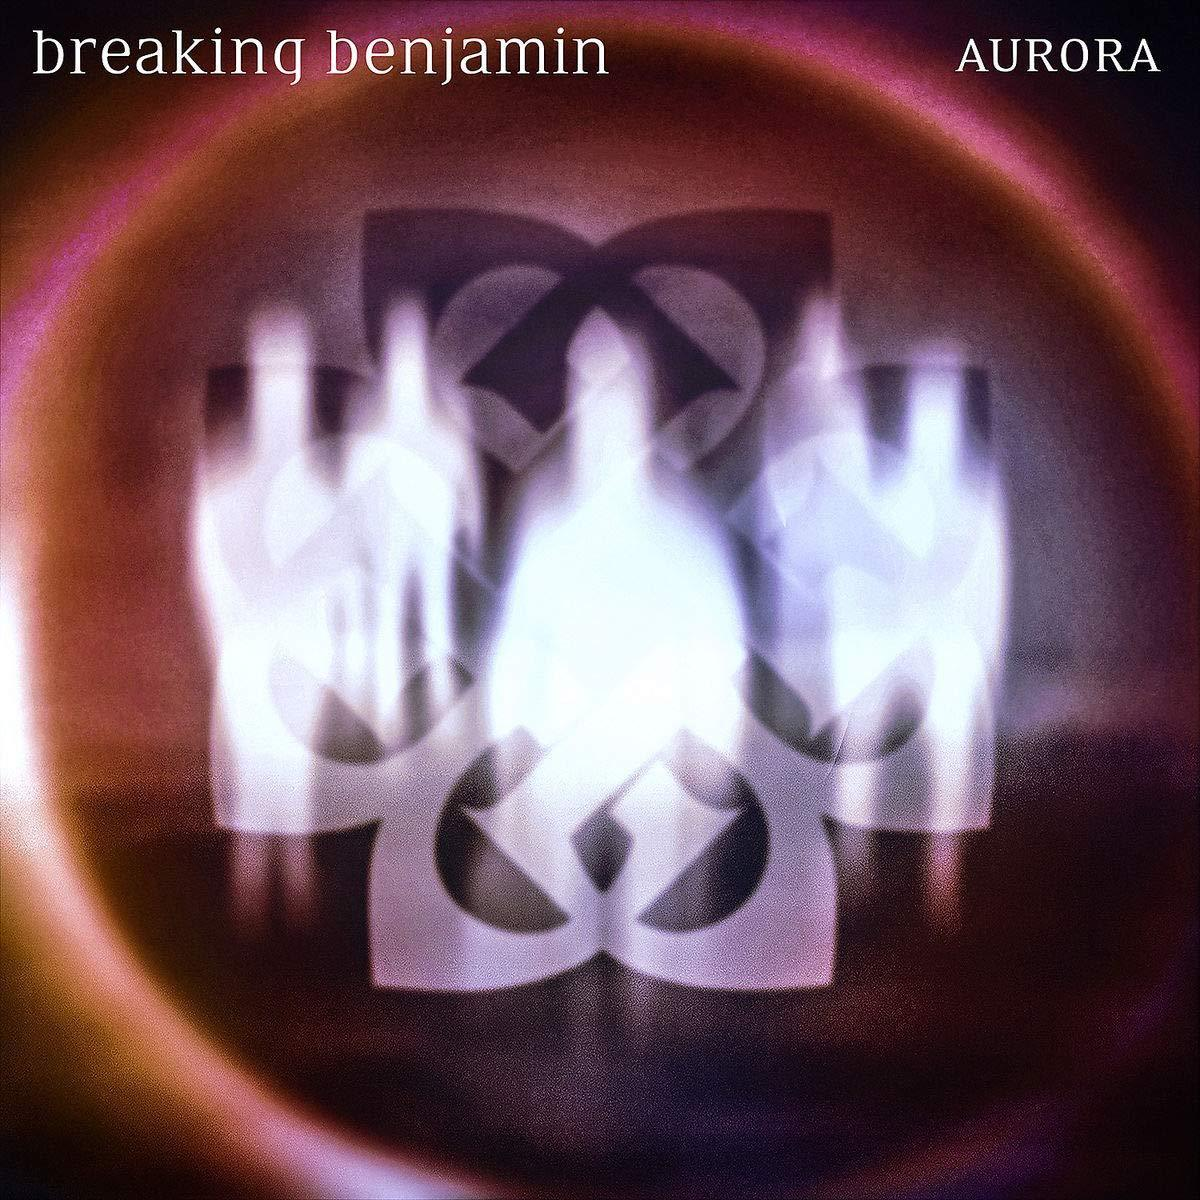 Breaking Benjamin - Aurora (Albumcover)